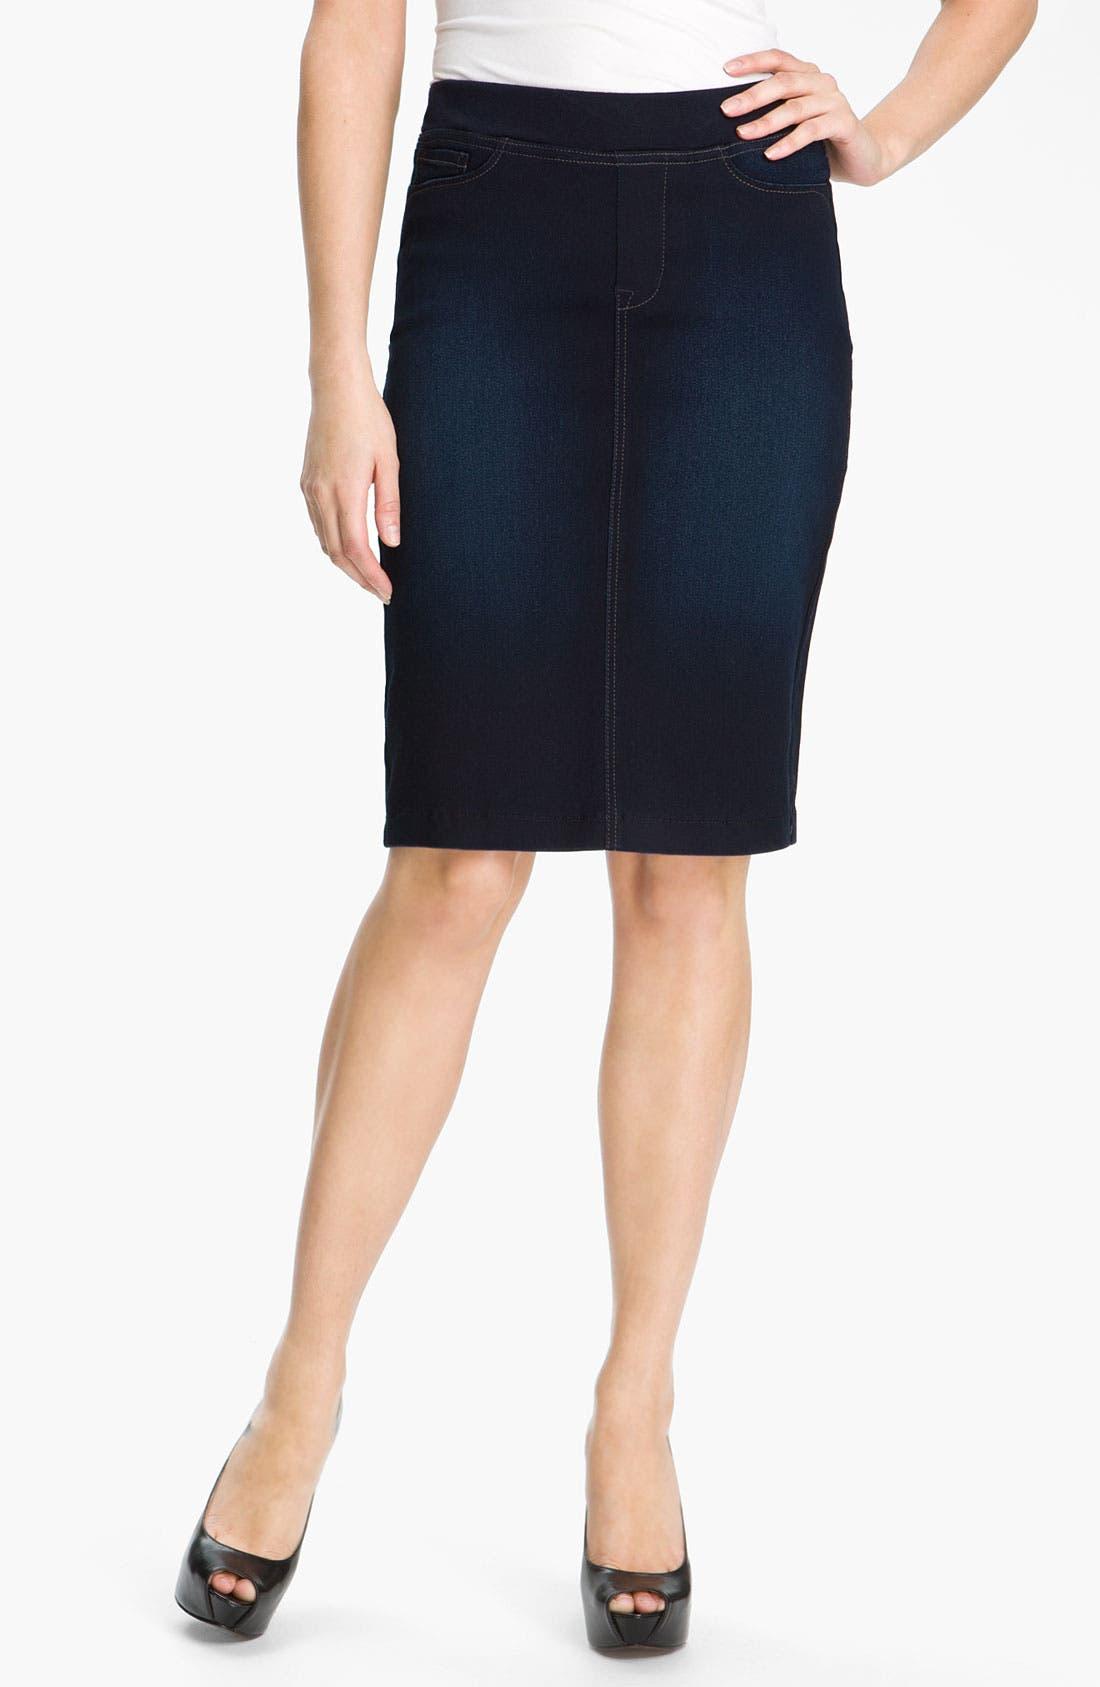 Alternate Image 1 Selected - NYDJ 'Caitlyn' Pull-On Denim Skirt